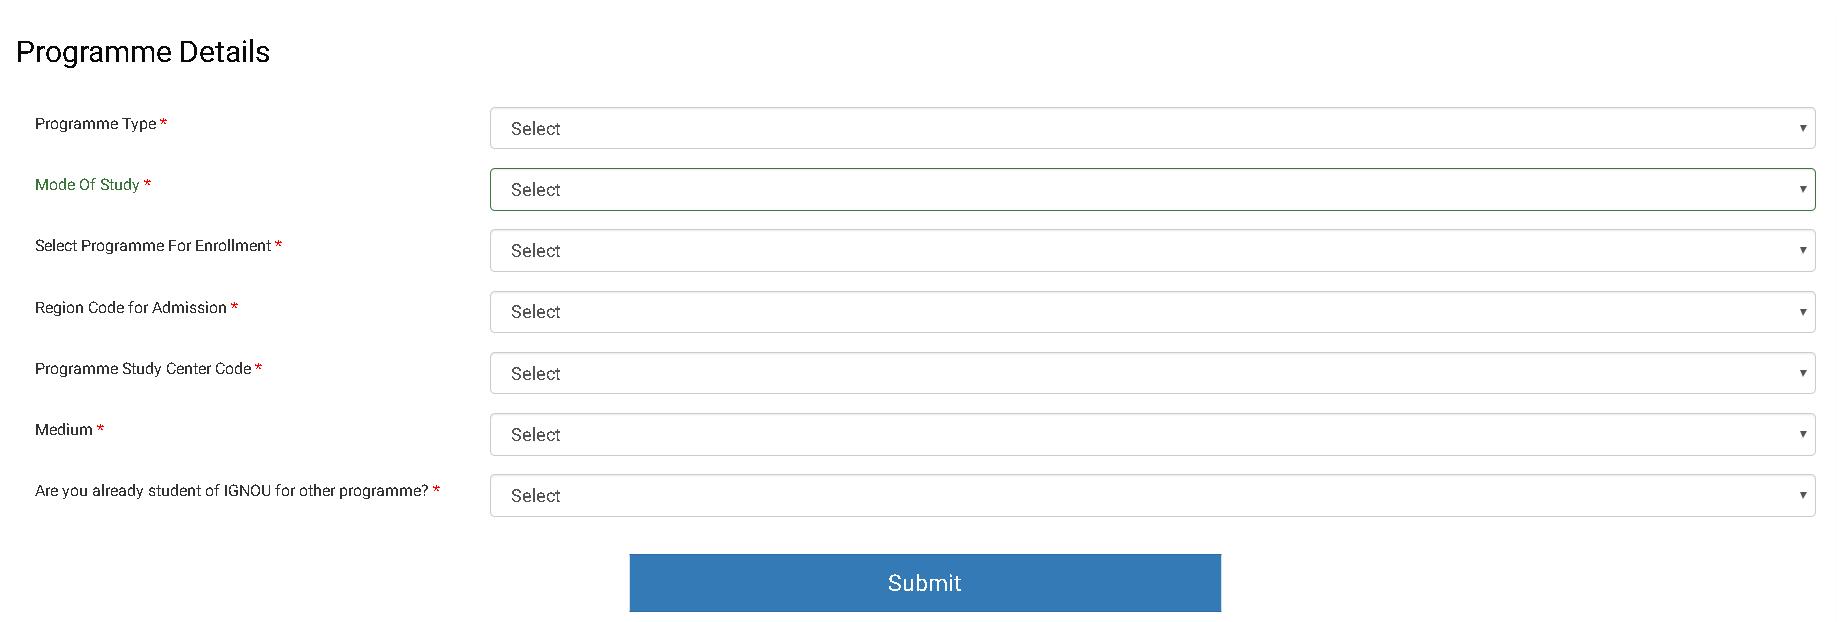 IGNOU Application Form Programme Details